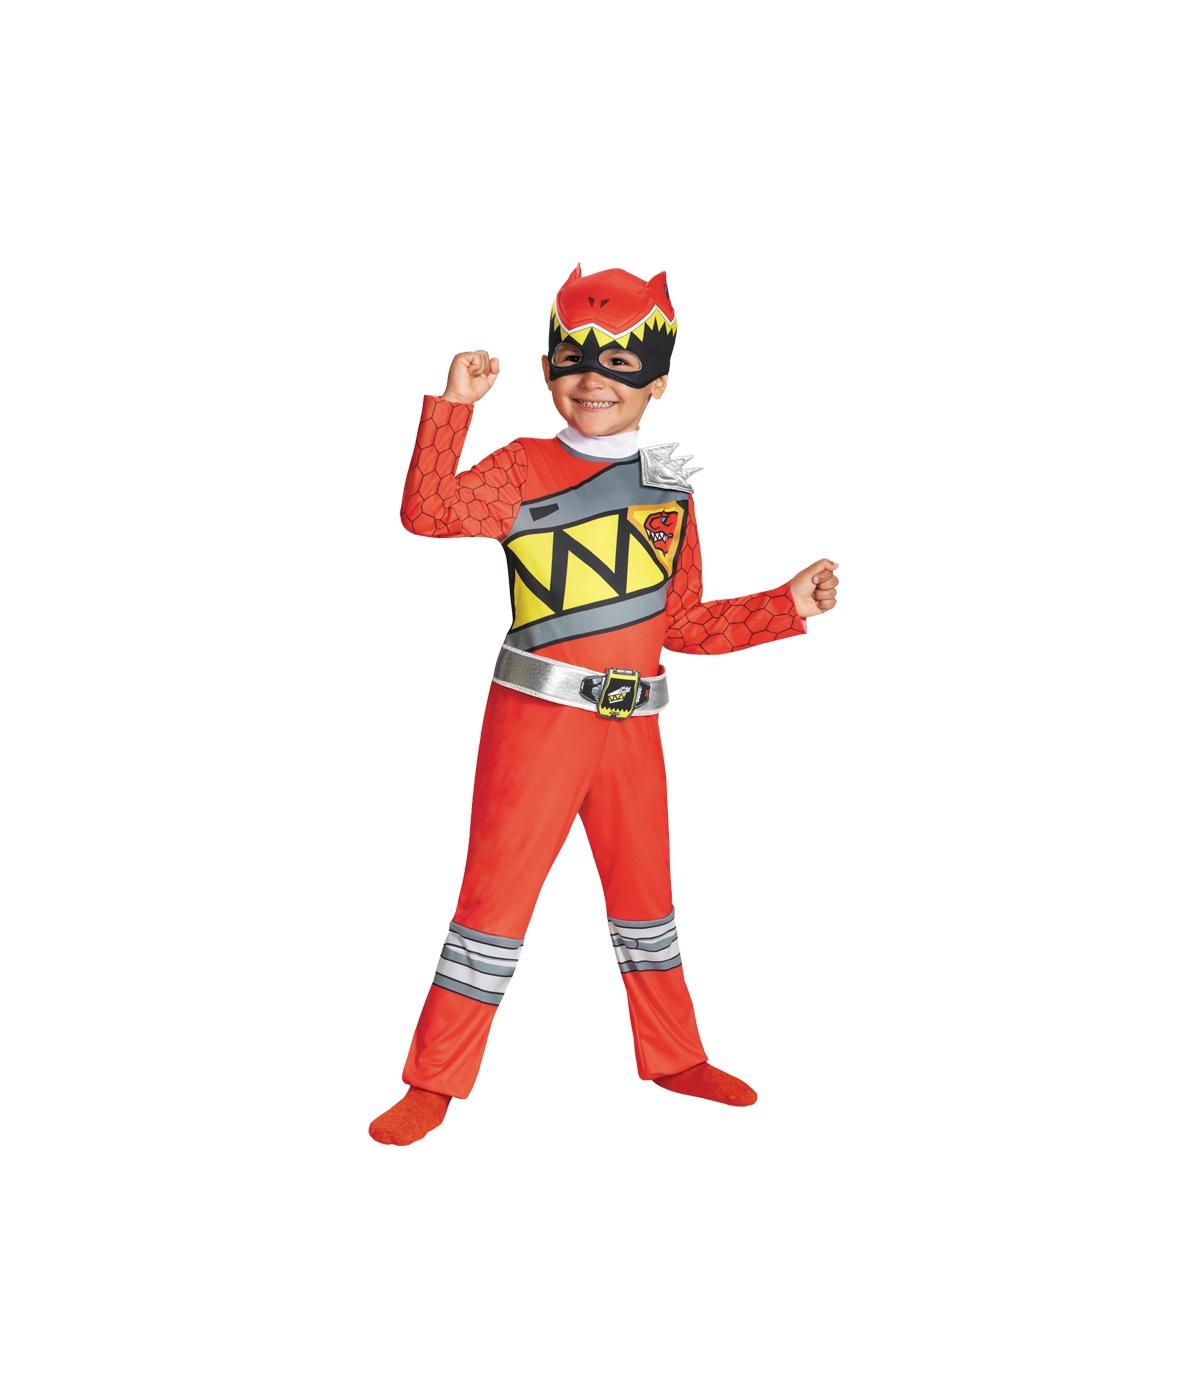 power rangers dino thunder red boys costume superhero. Black Bedroom Furniture Sets. Home Design Ideas